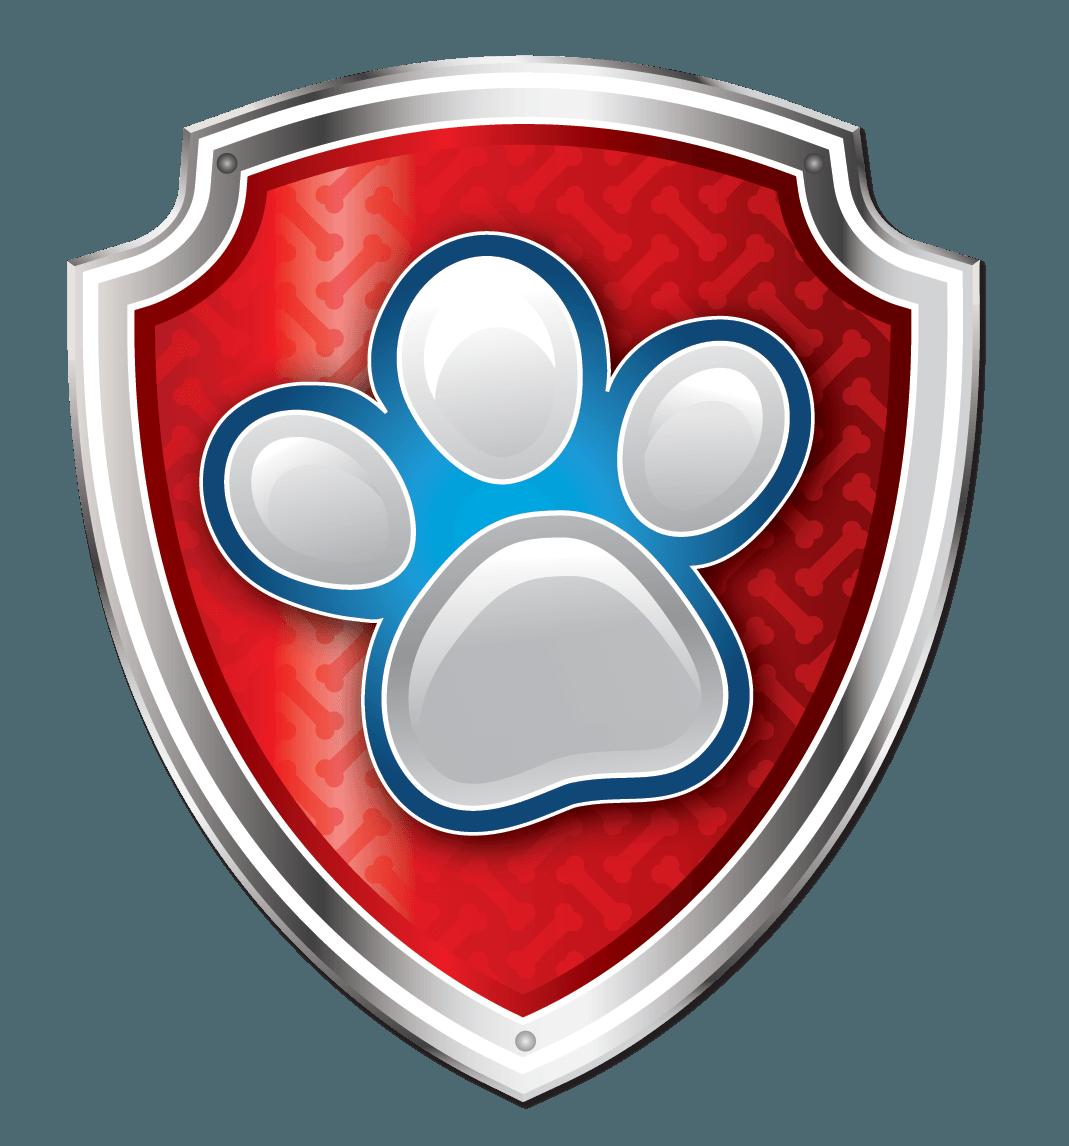 logos escudos paw patrol o patrulla canina para imprimir gratis todo peques. Black Bedroom Furniture Sets. Home Design Ideas